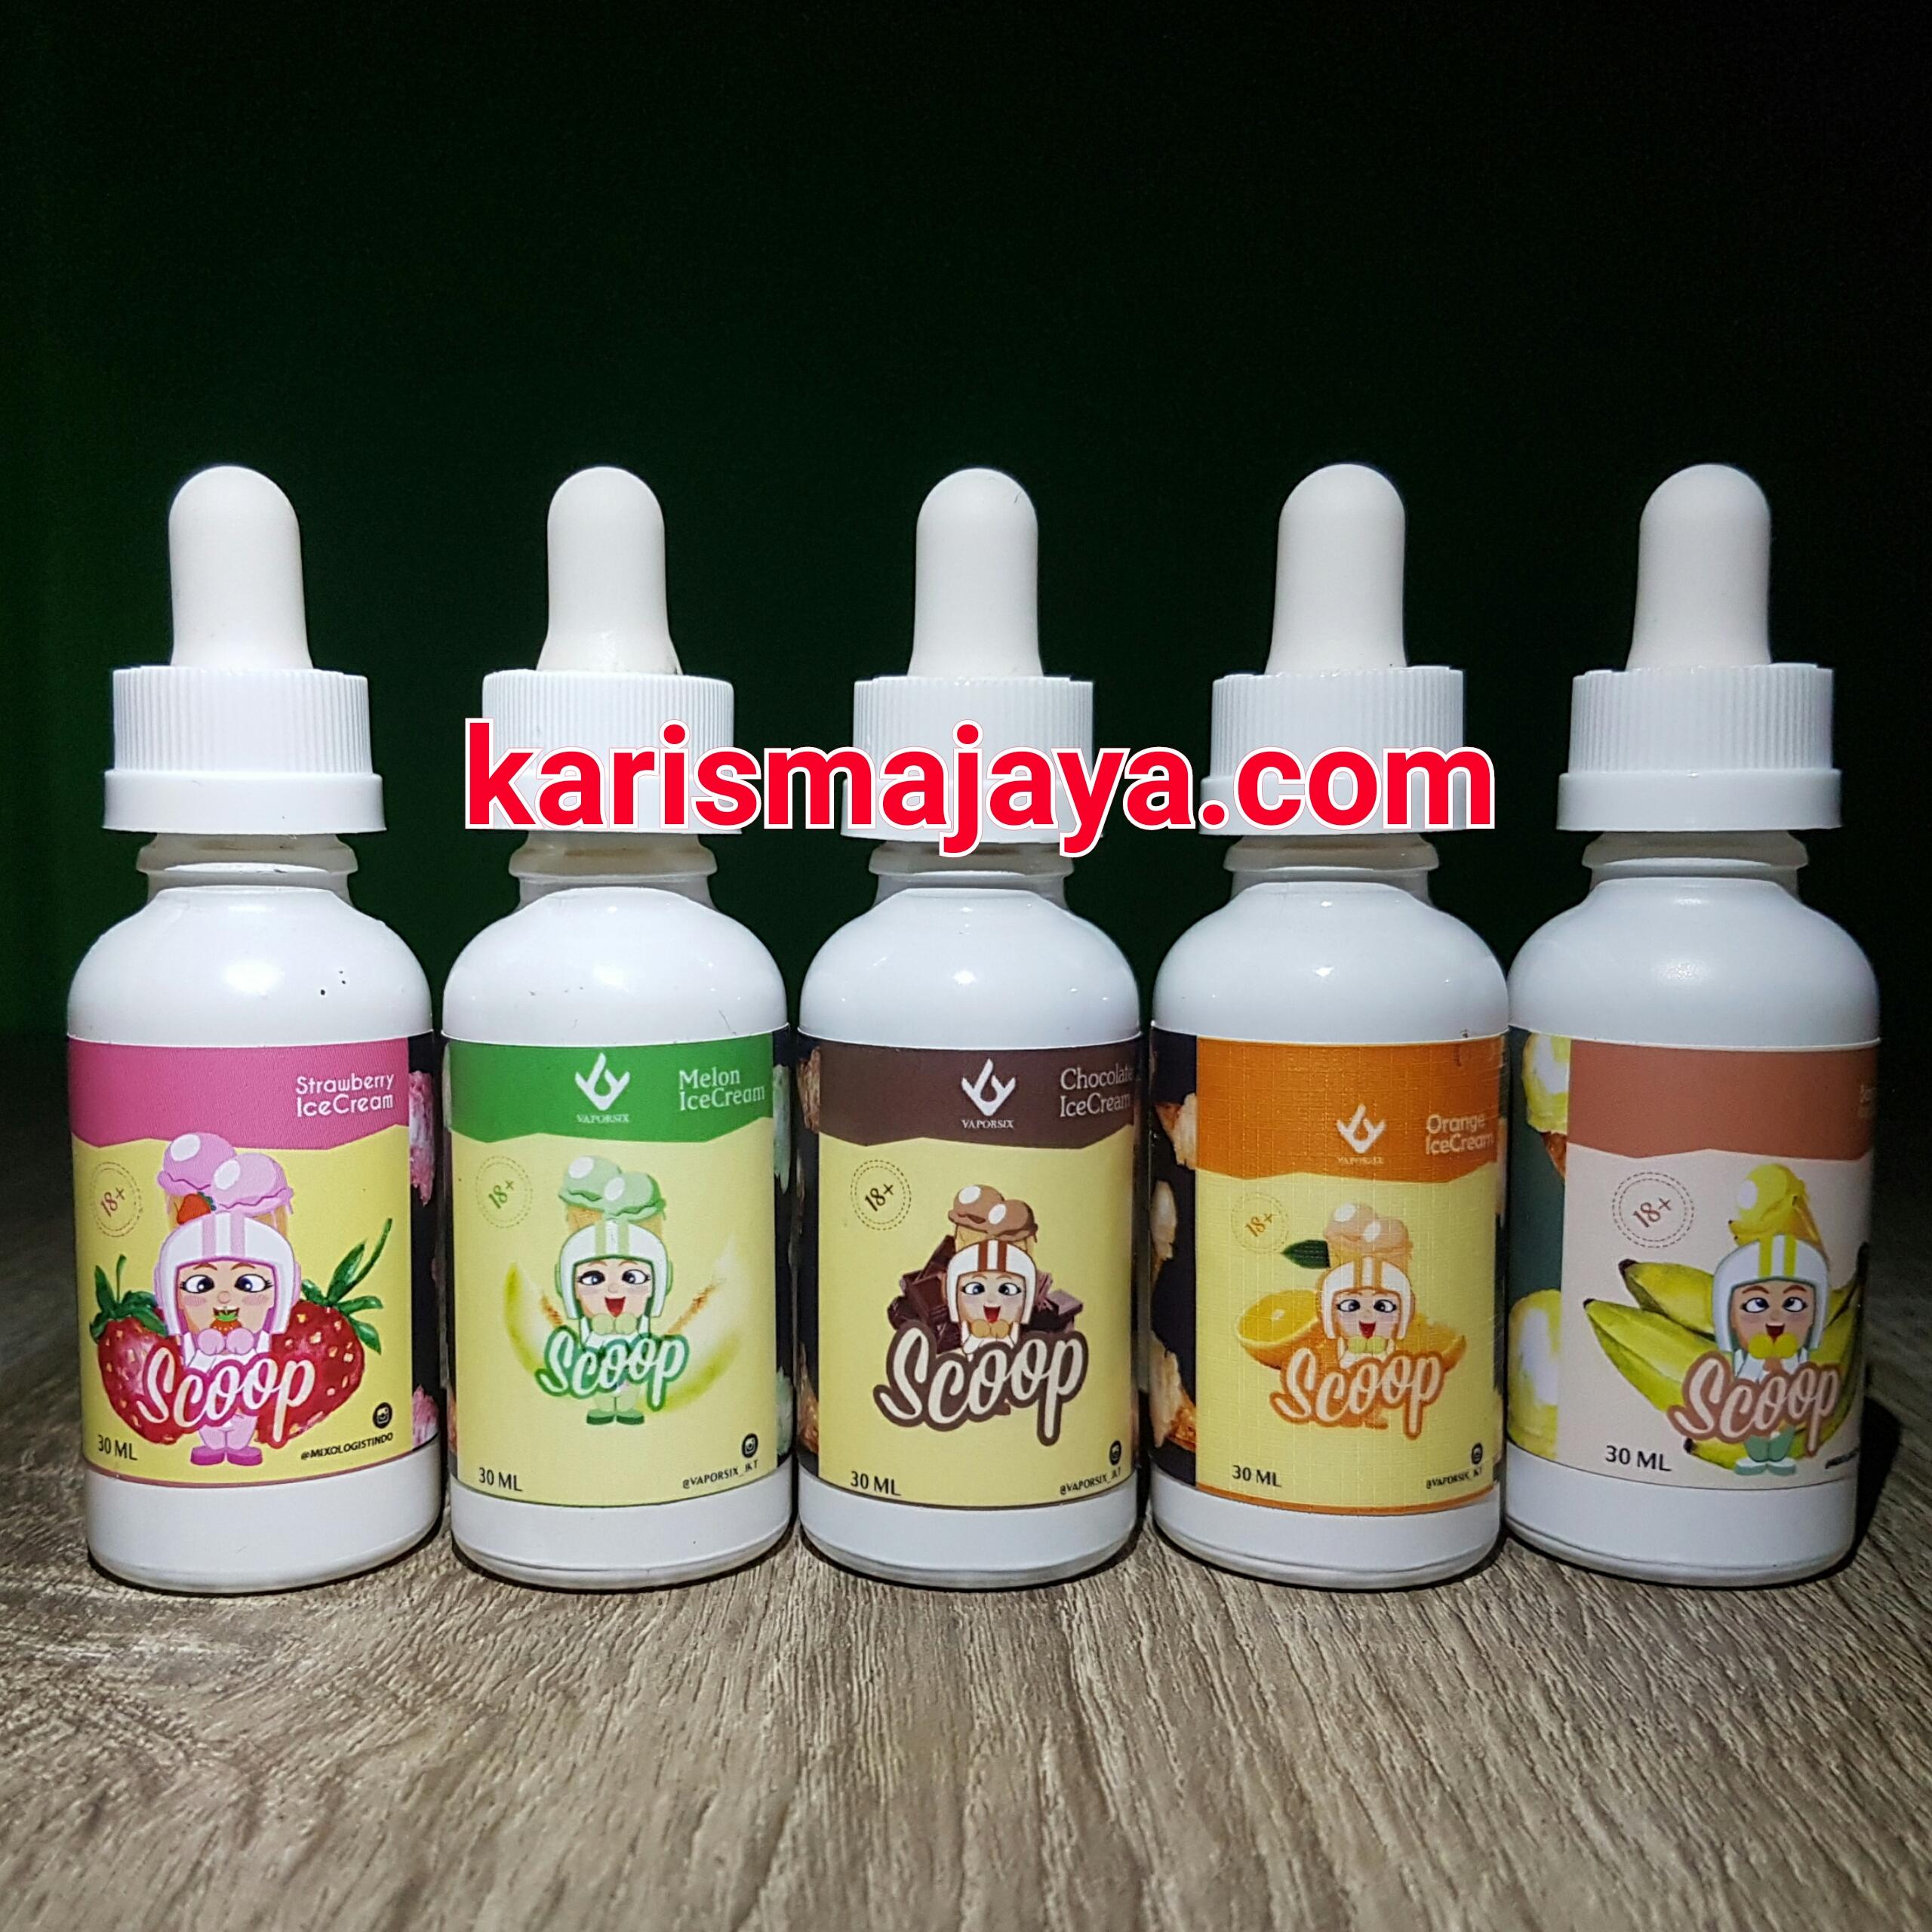 E Liquid Vapor Vape Bucks Cream 2 3mg 30ml Daftar Harga Terkini Premium Yacult Ace 60ml Jm354 Y Source Scoop